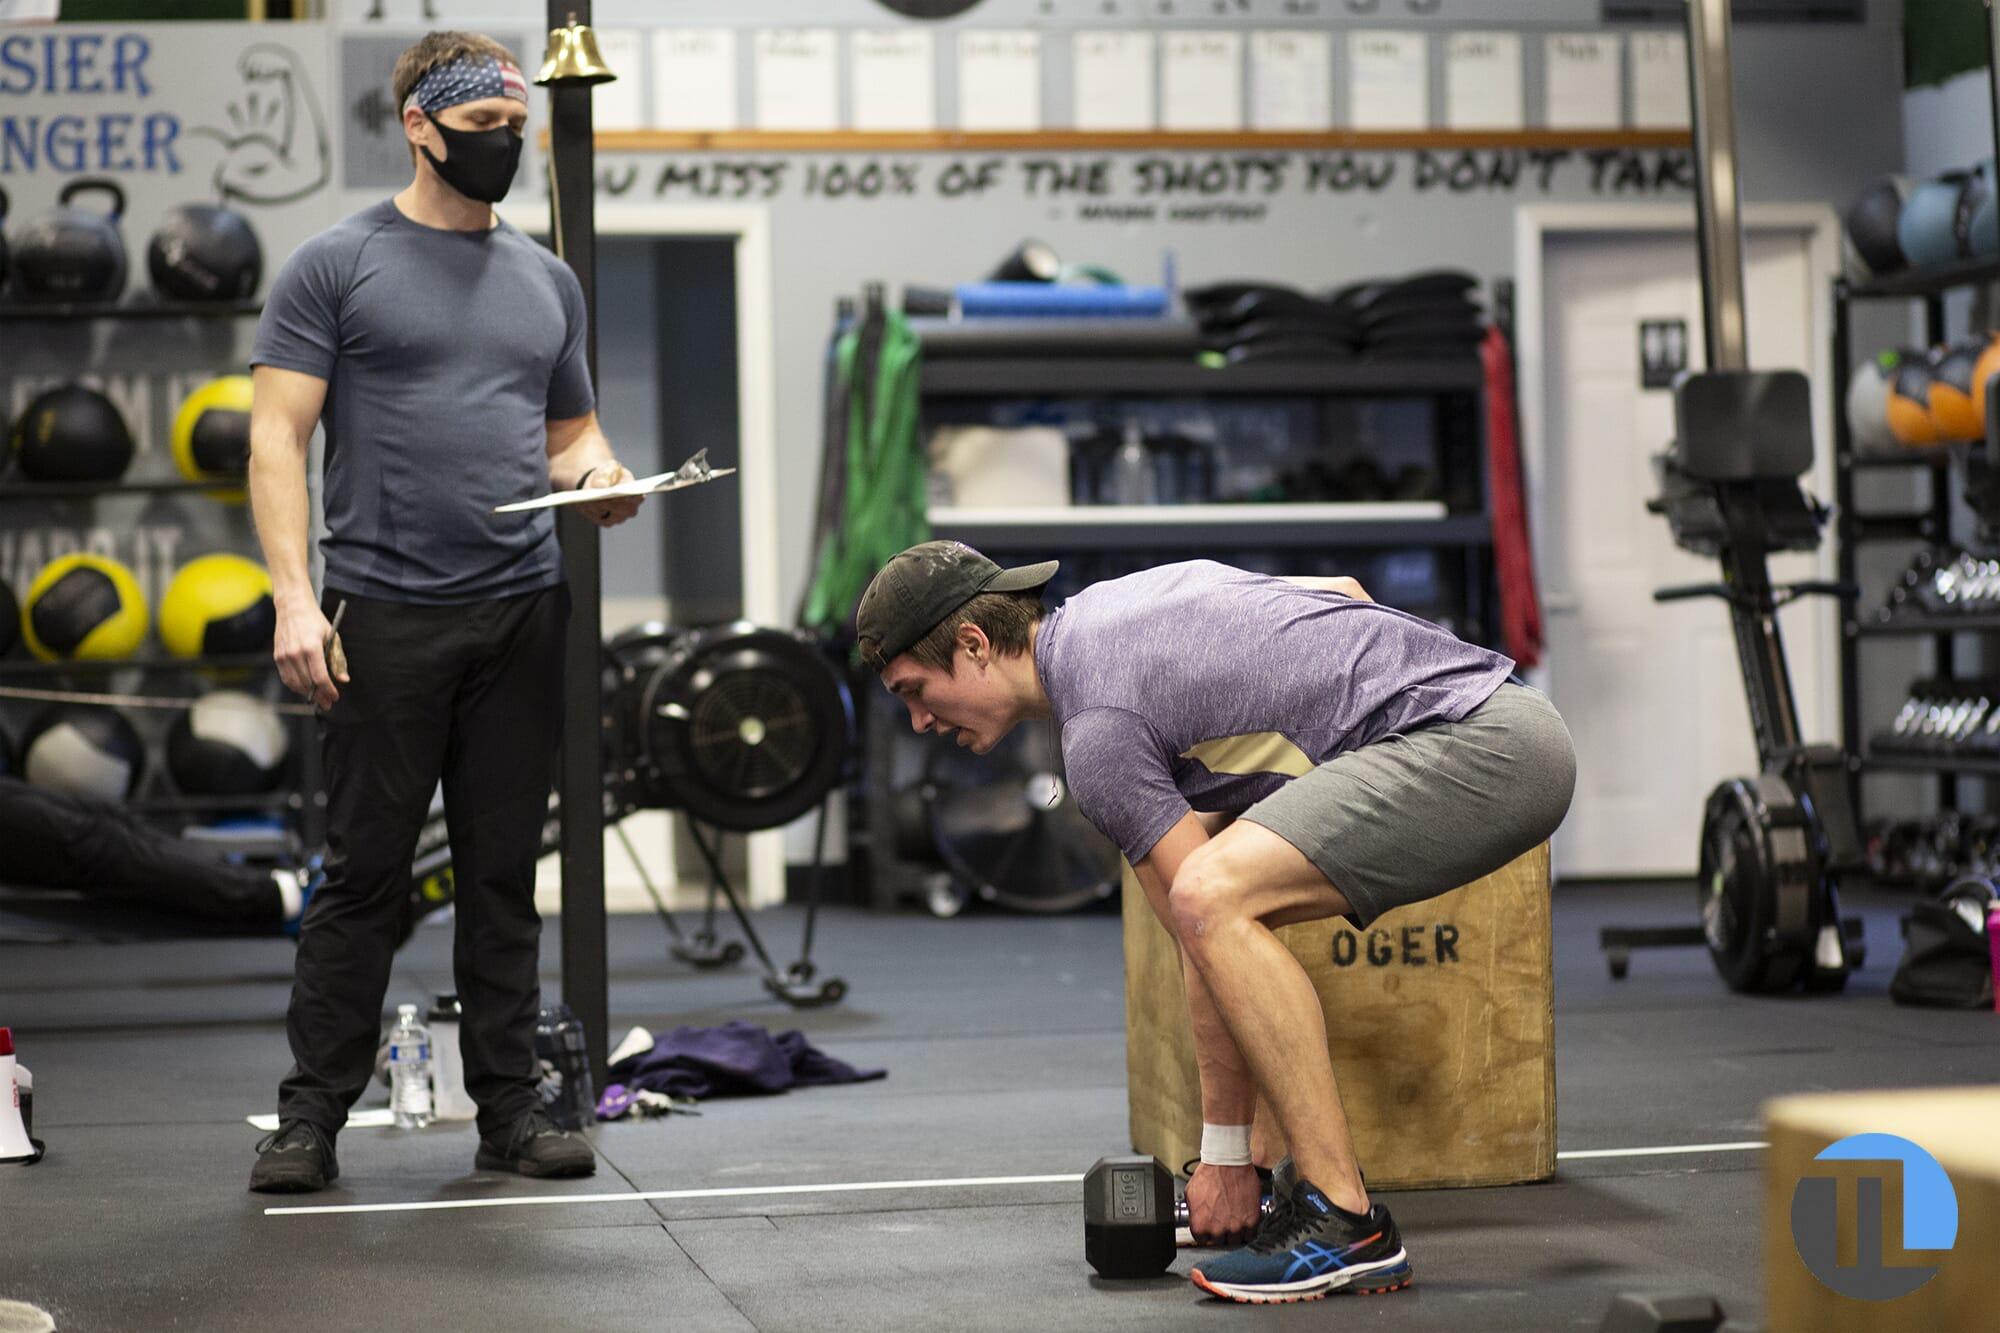 Lake Stevens personal trainer wears mask